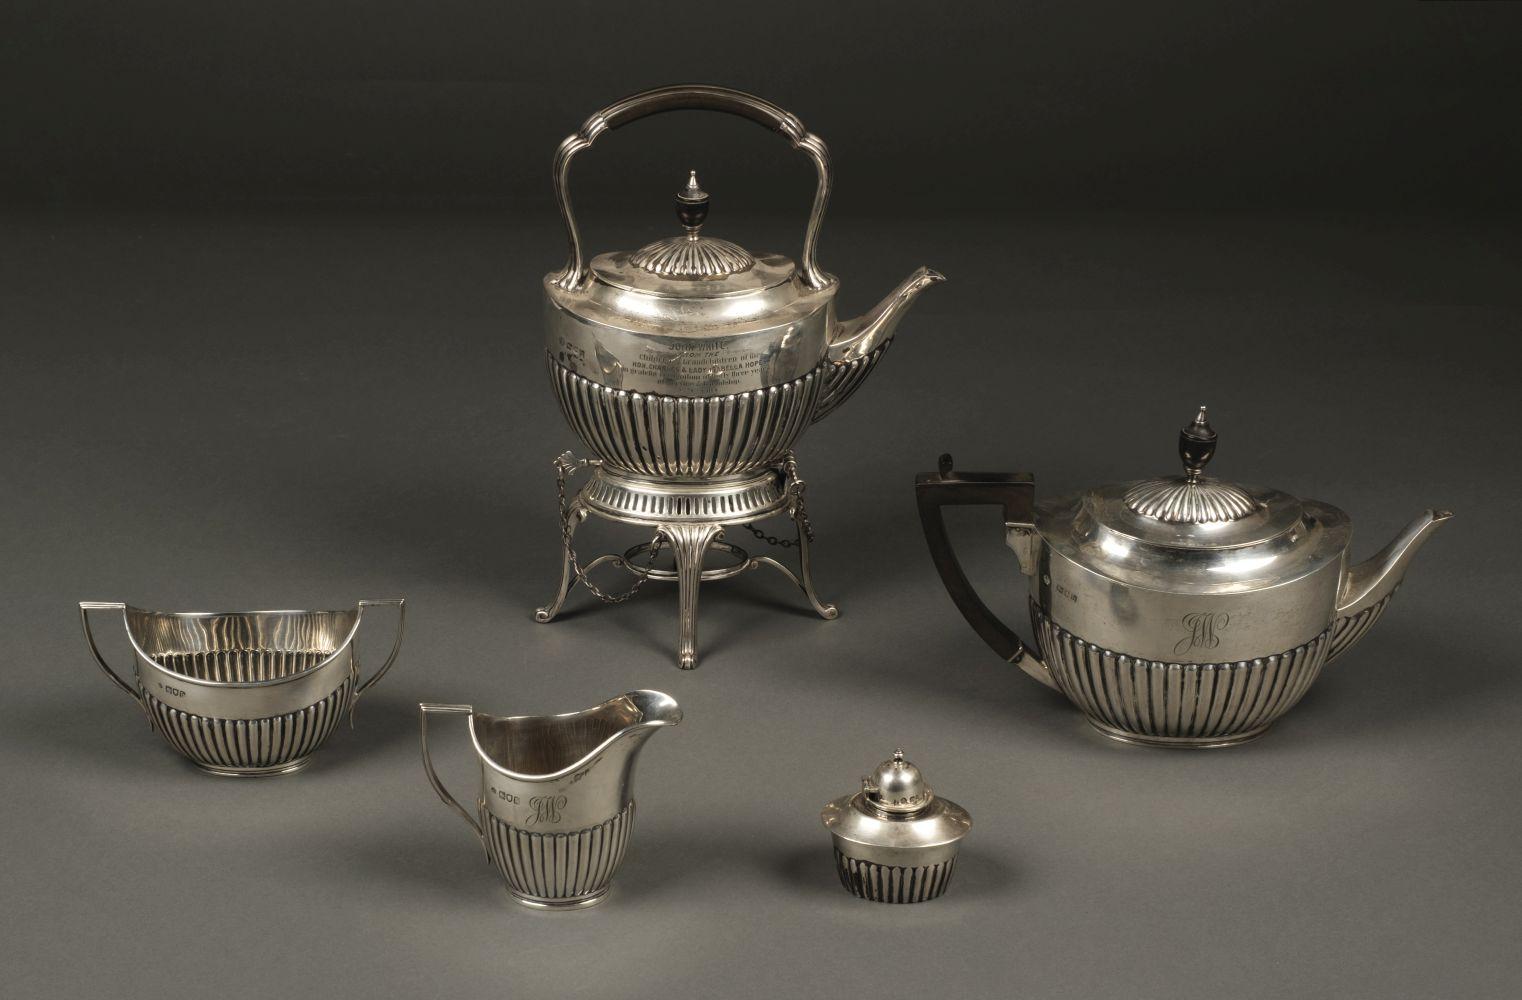 * Tea Set. An Edwardian silver 4-piece tea set